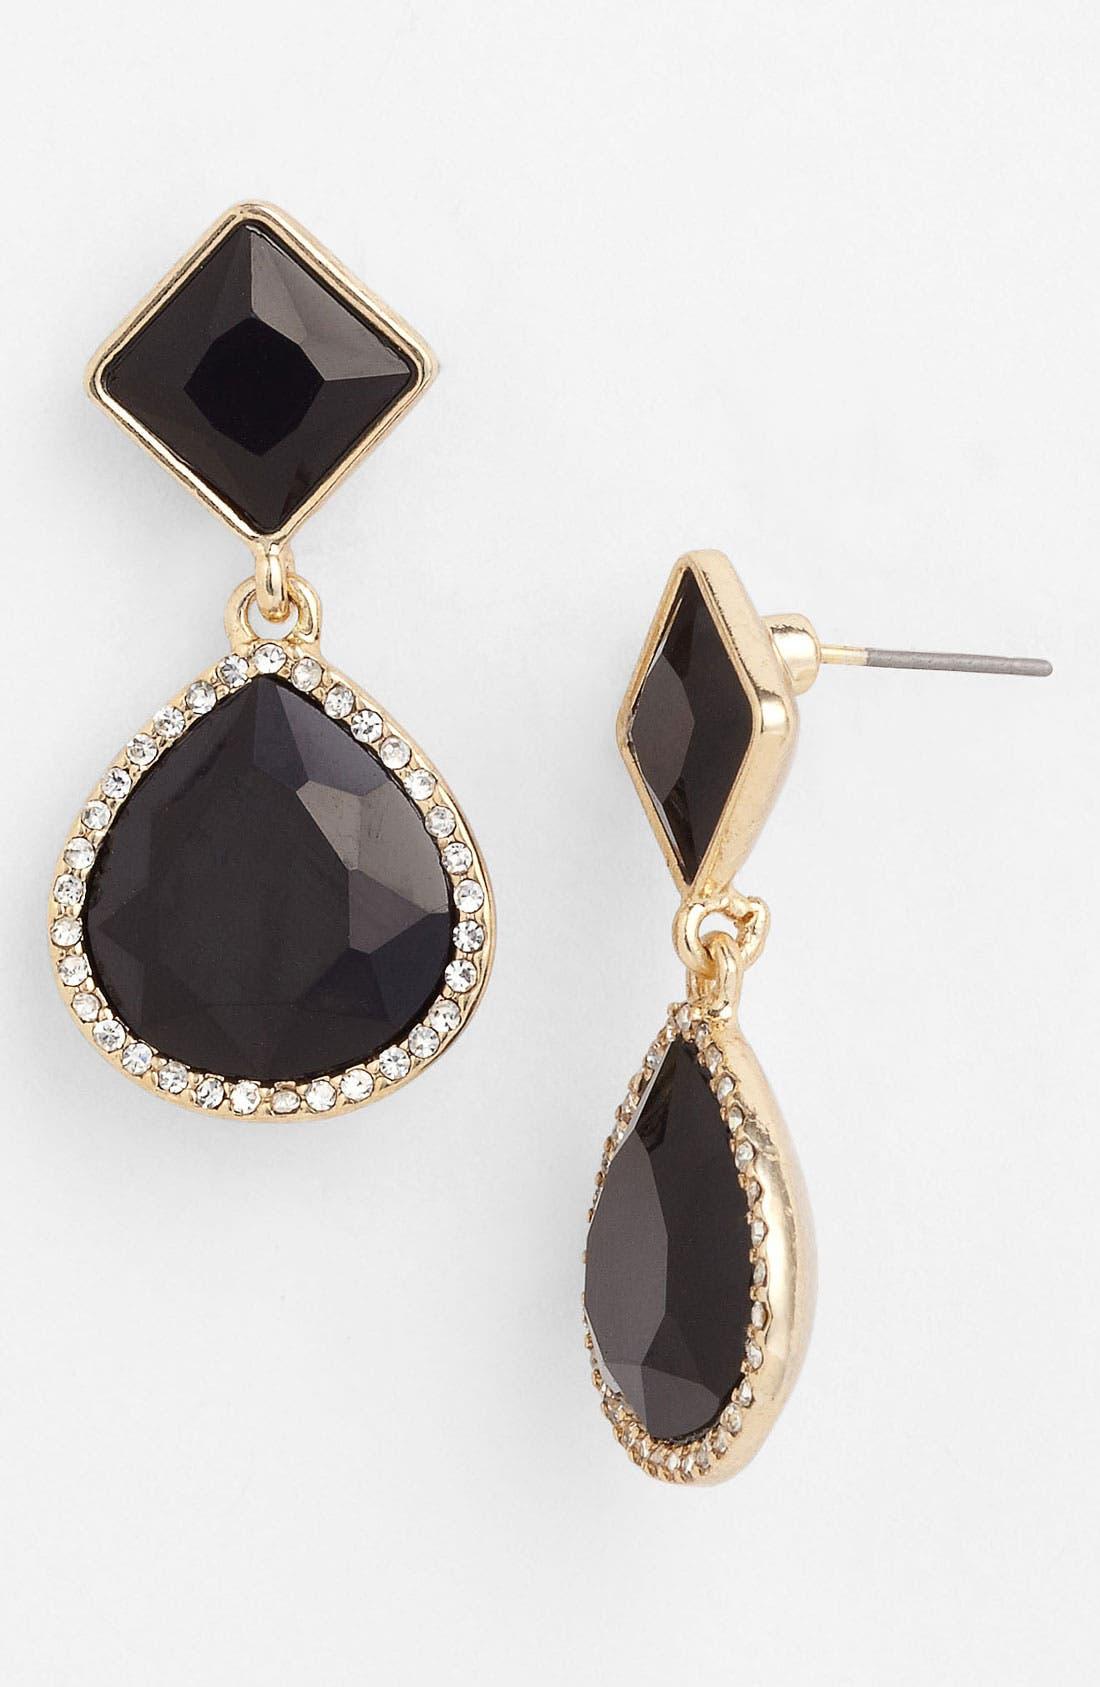 ANNE KLEIN, Drop Earrings, Main thumbnail 1, color, 001